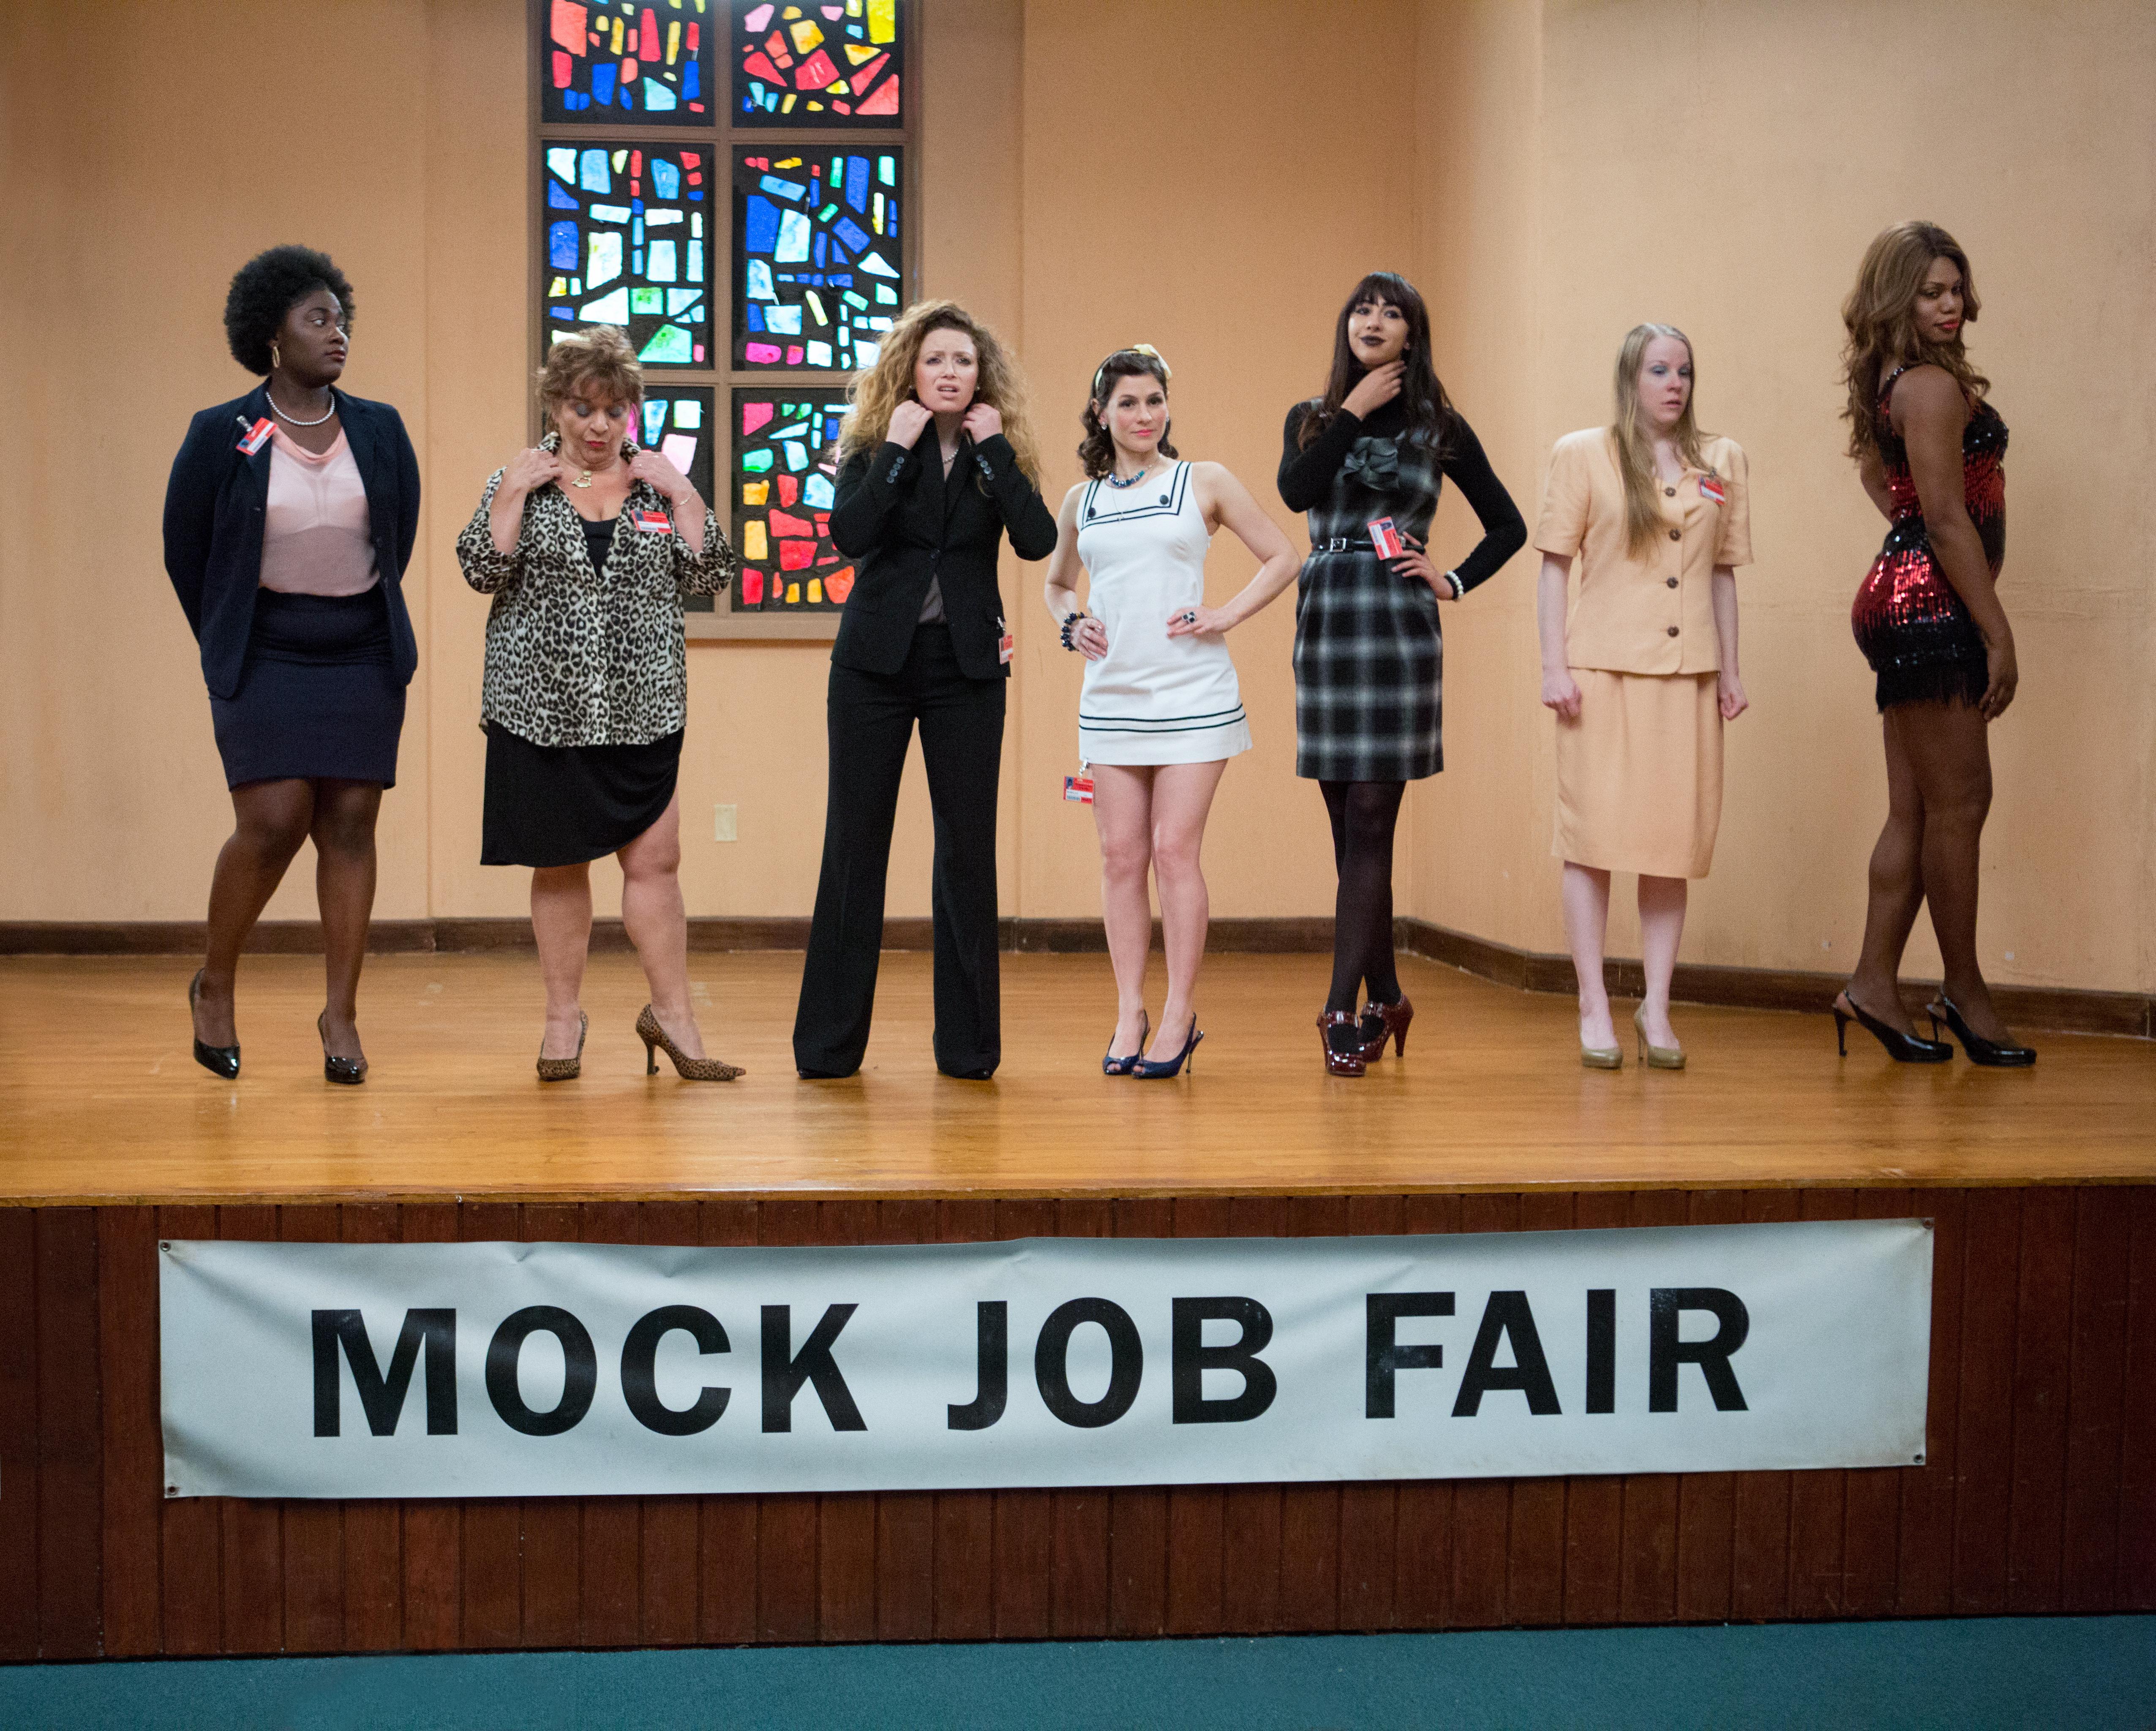 (L-R) Danielle Brooks, Lin Tucci, Natasha Lyonne, Yael Stone, Jackie Cruz, Emma Myles and Laverne Cox